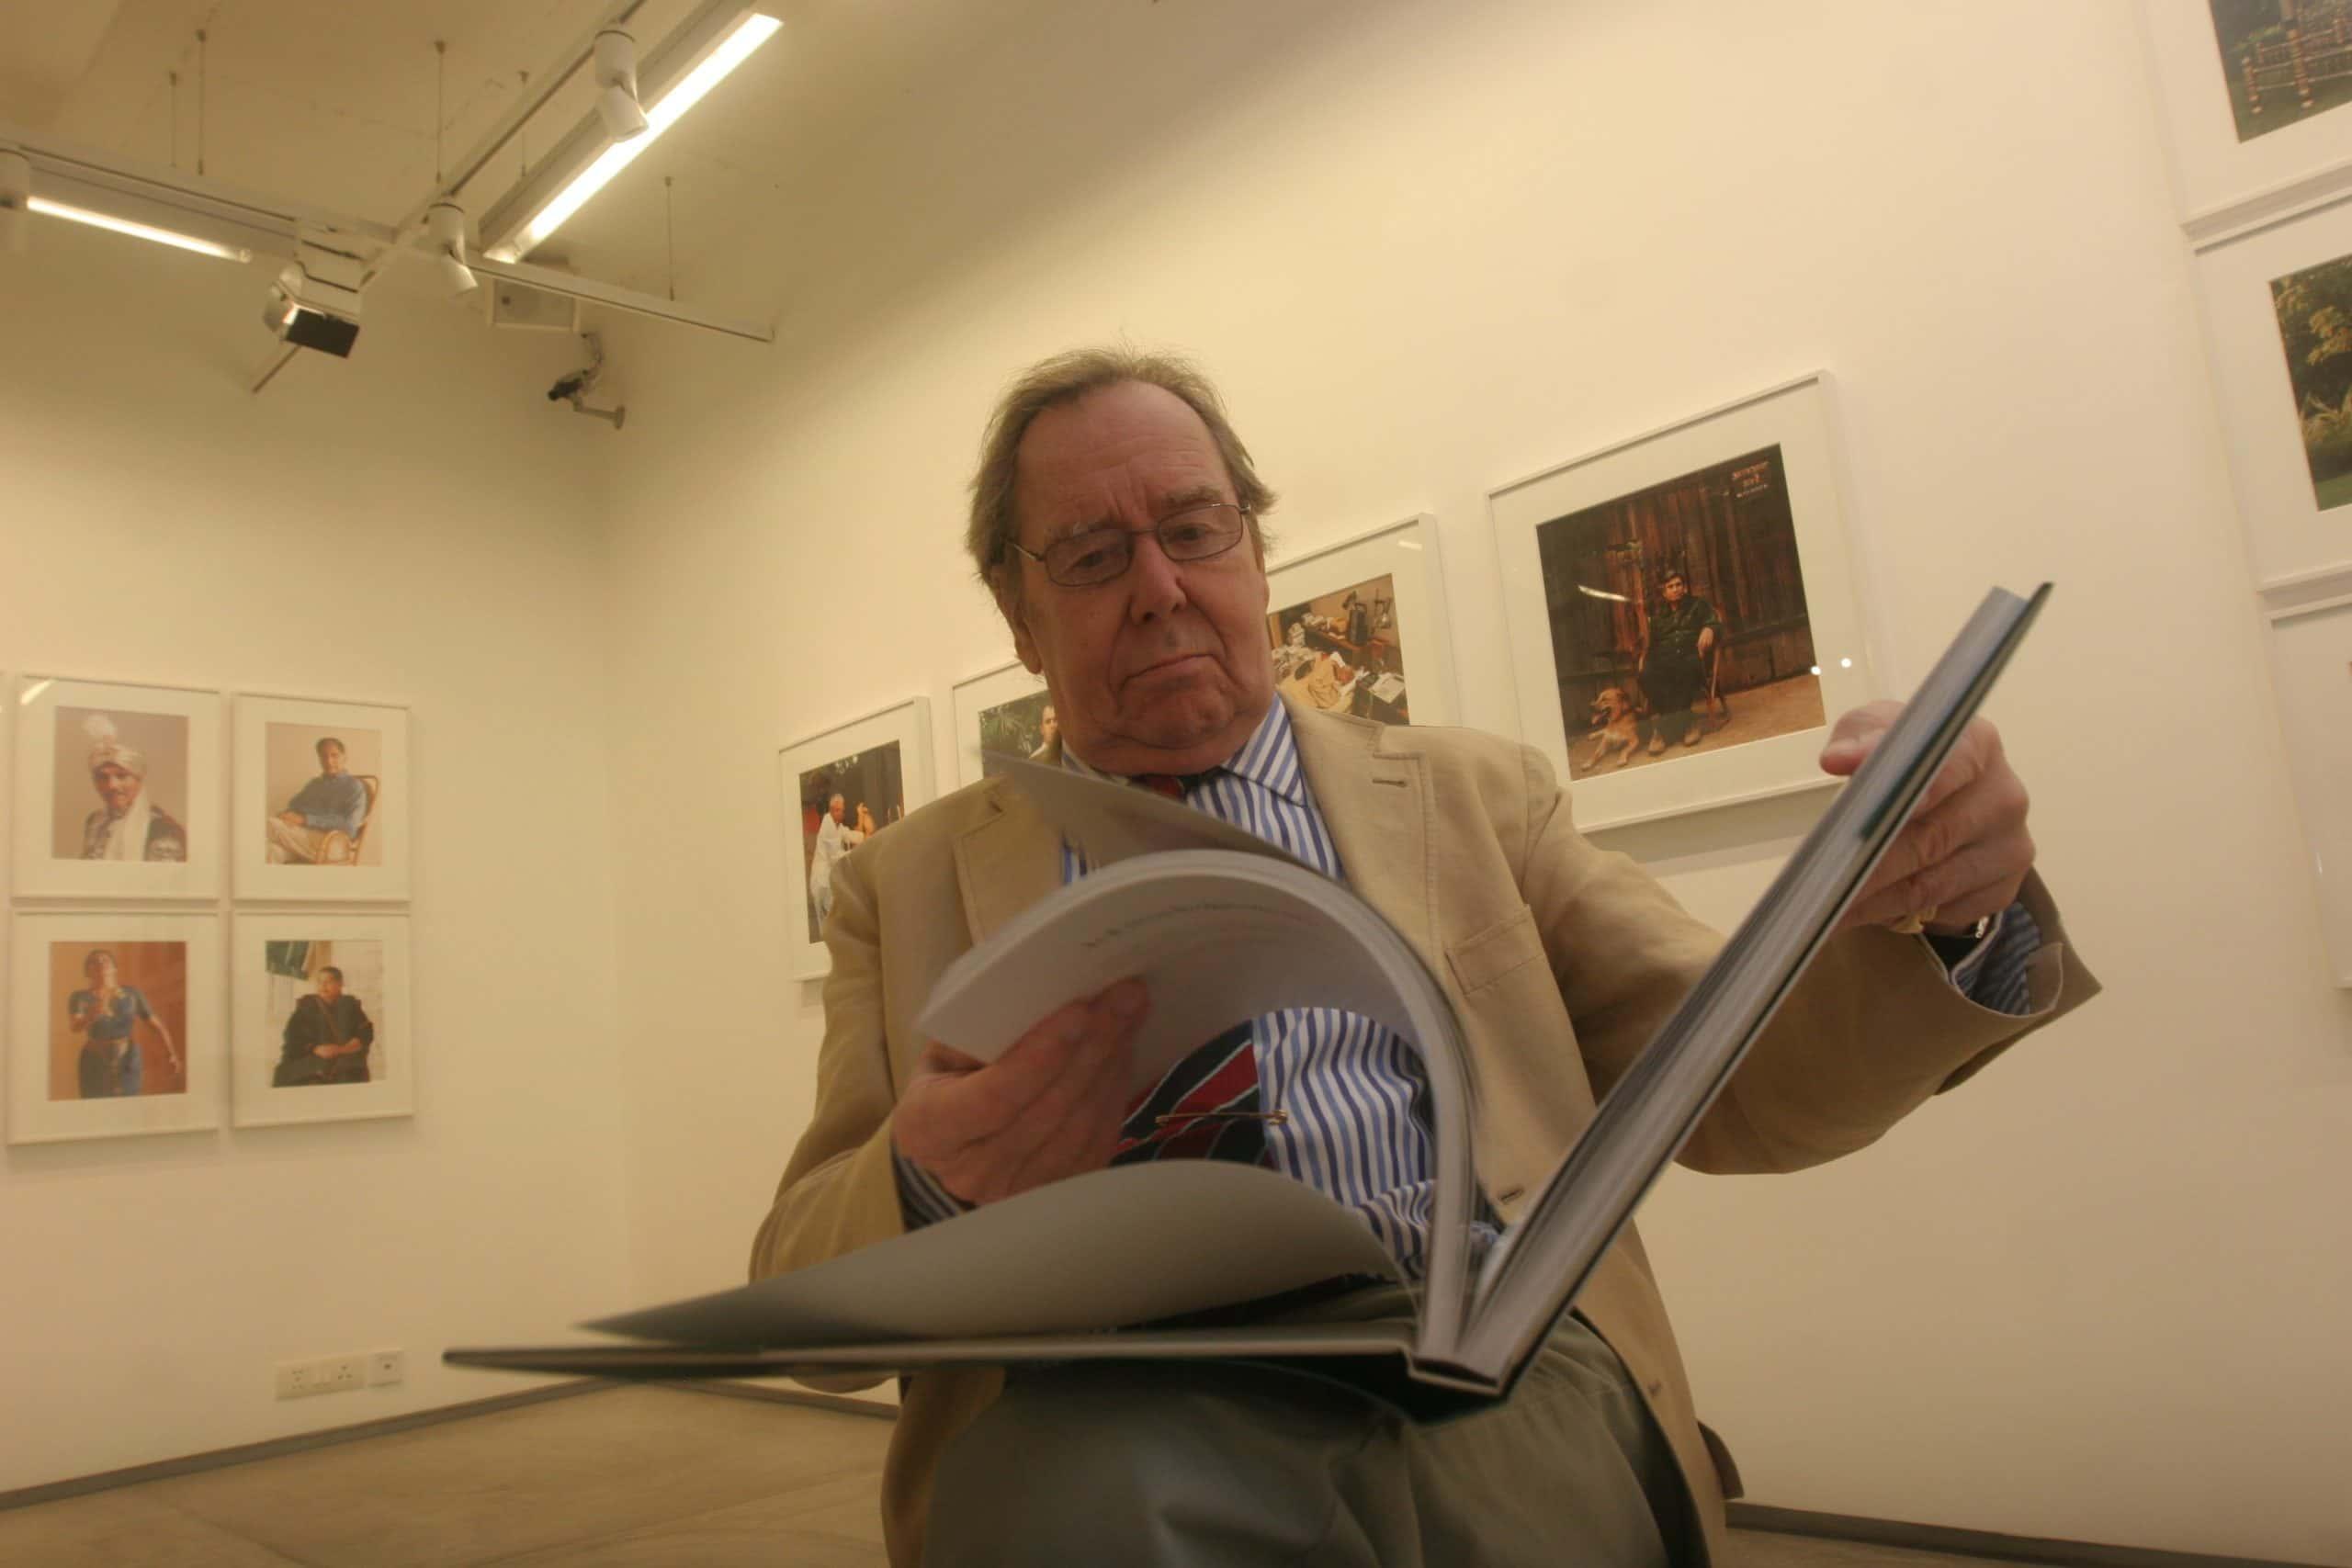 Antony Armstrong-Jones, The Earl Of Snowdon facts